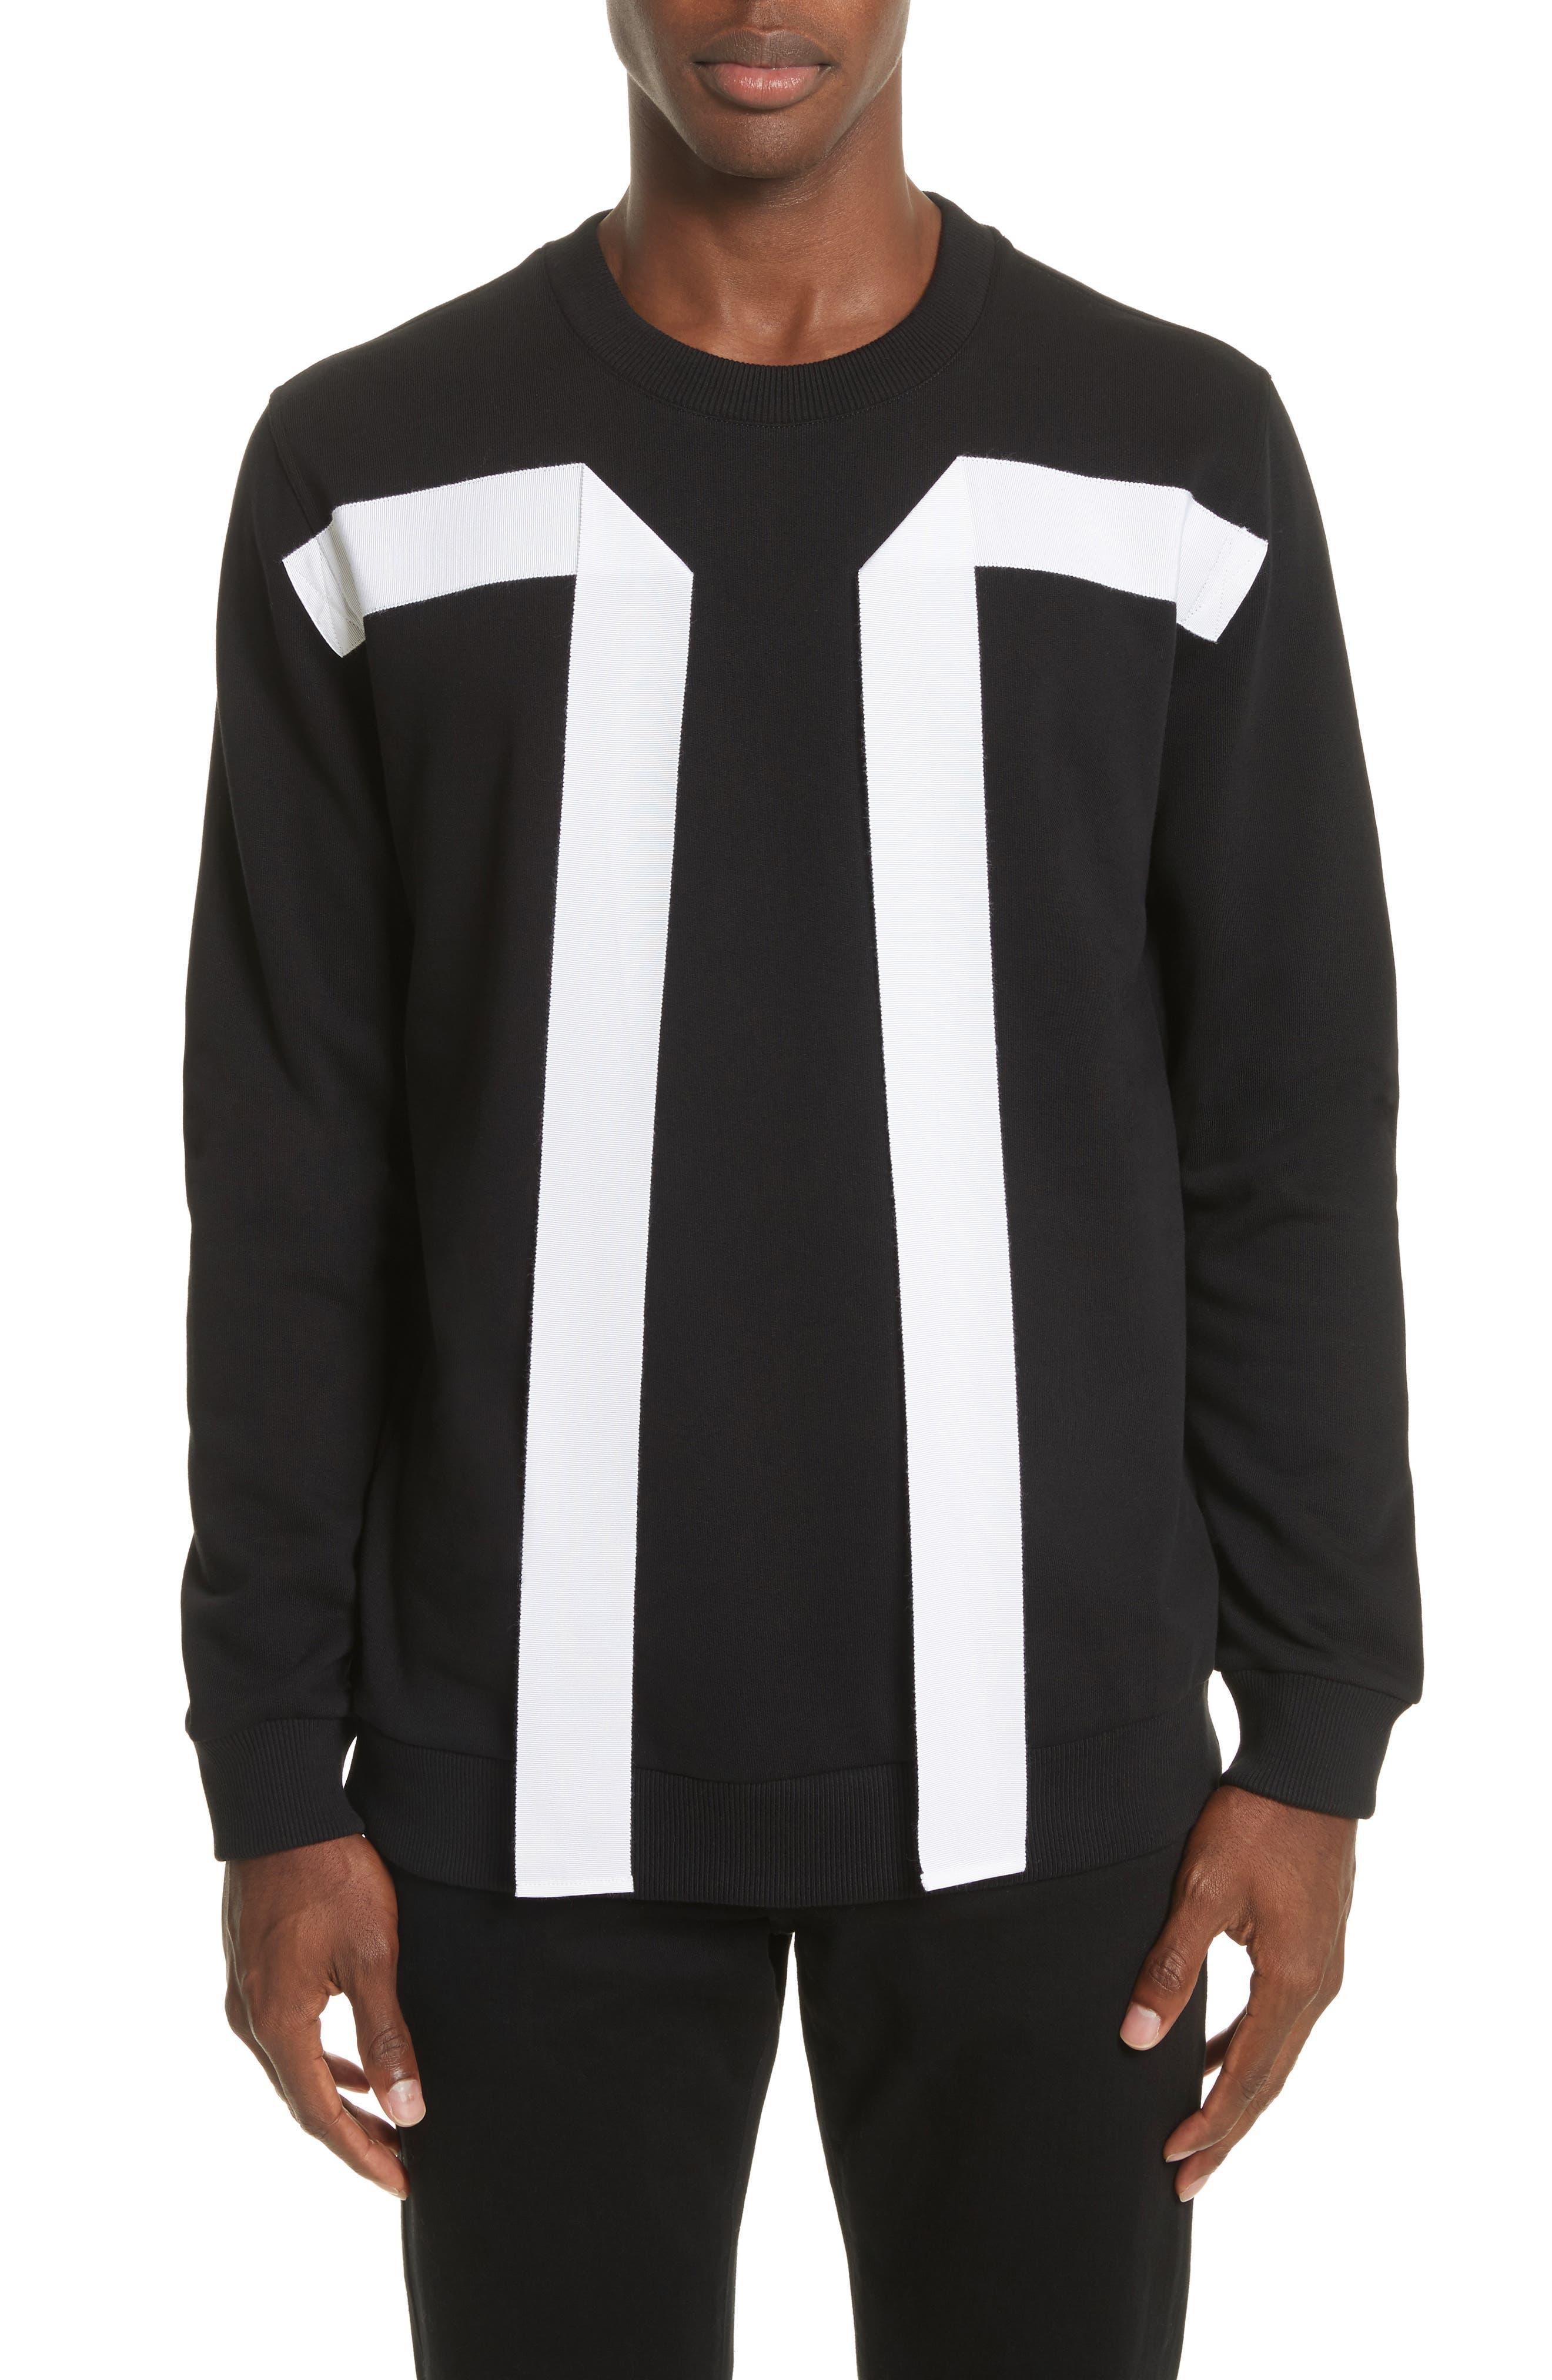 Flying Bands Crewneck Sweatshirt,                         Main,                         color, Black